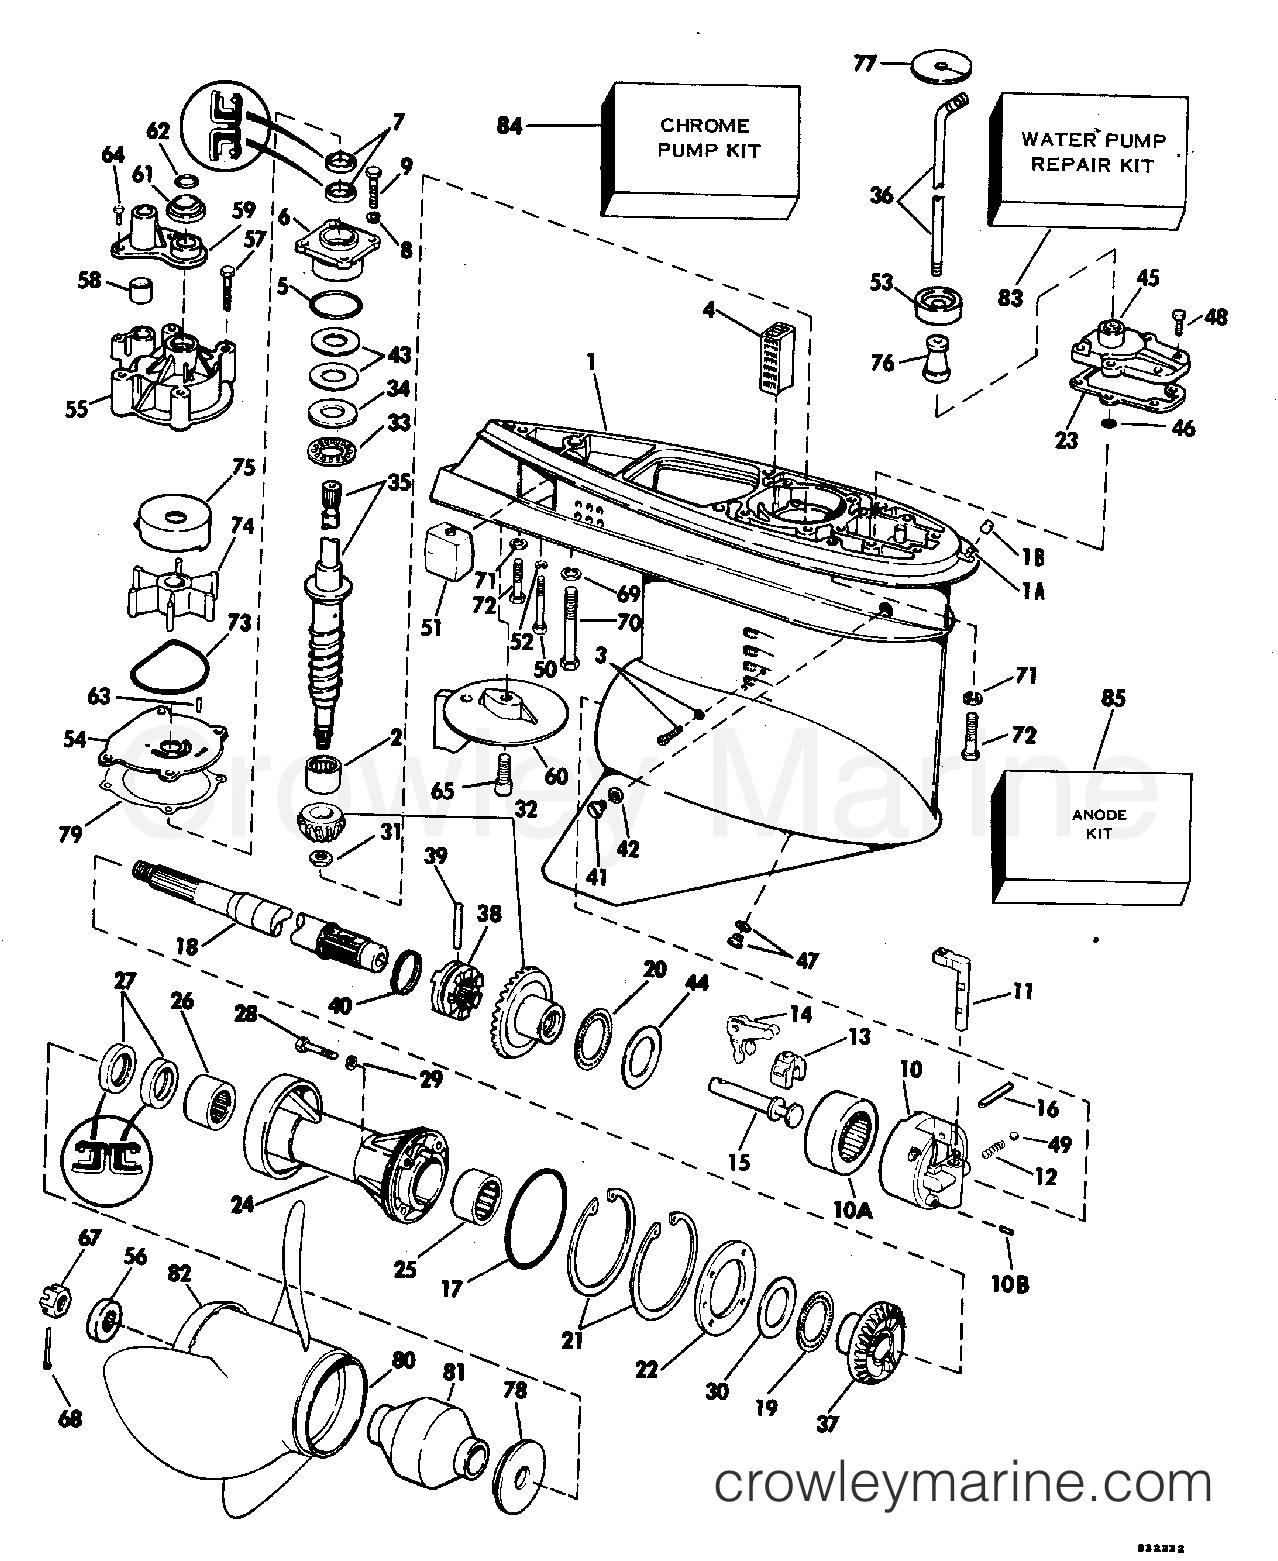 1983 Evinrude Outboards 200 - E200TRXCTD - GEARCASE